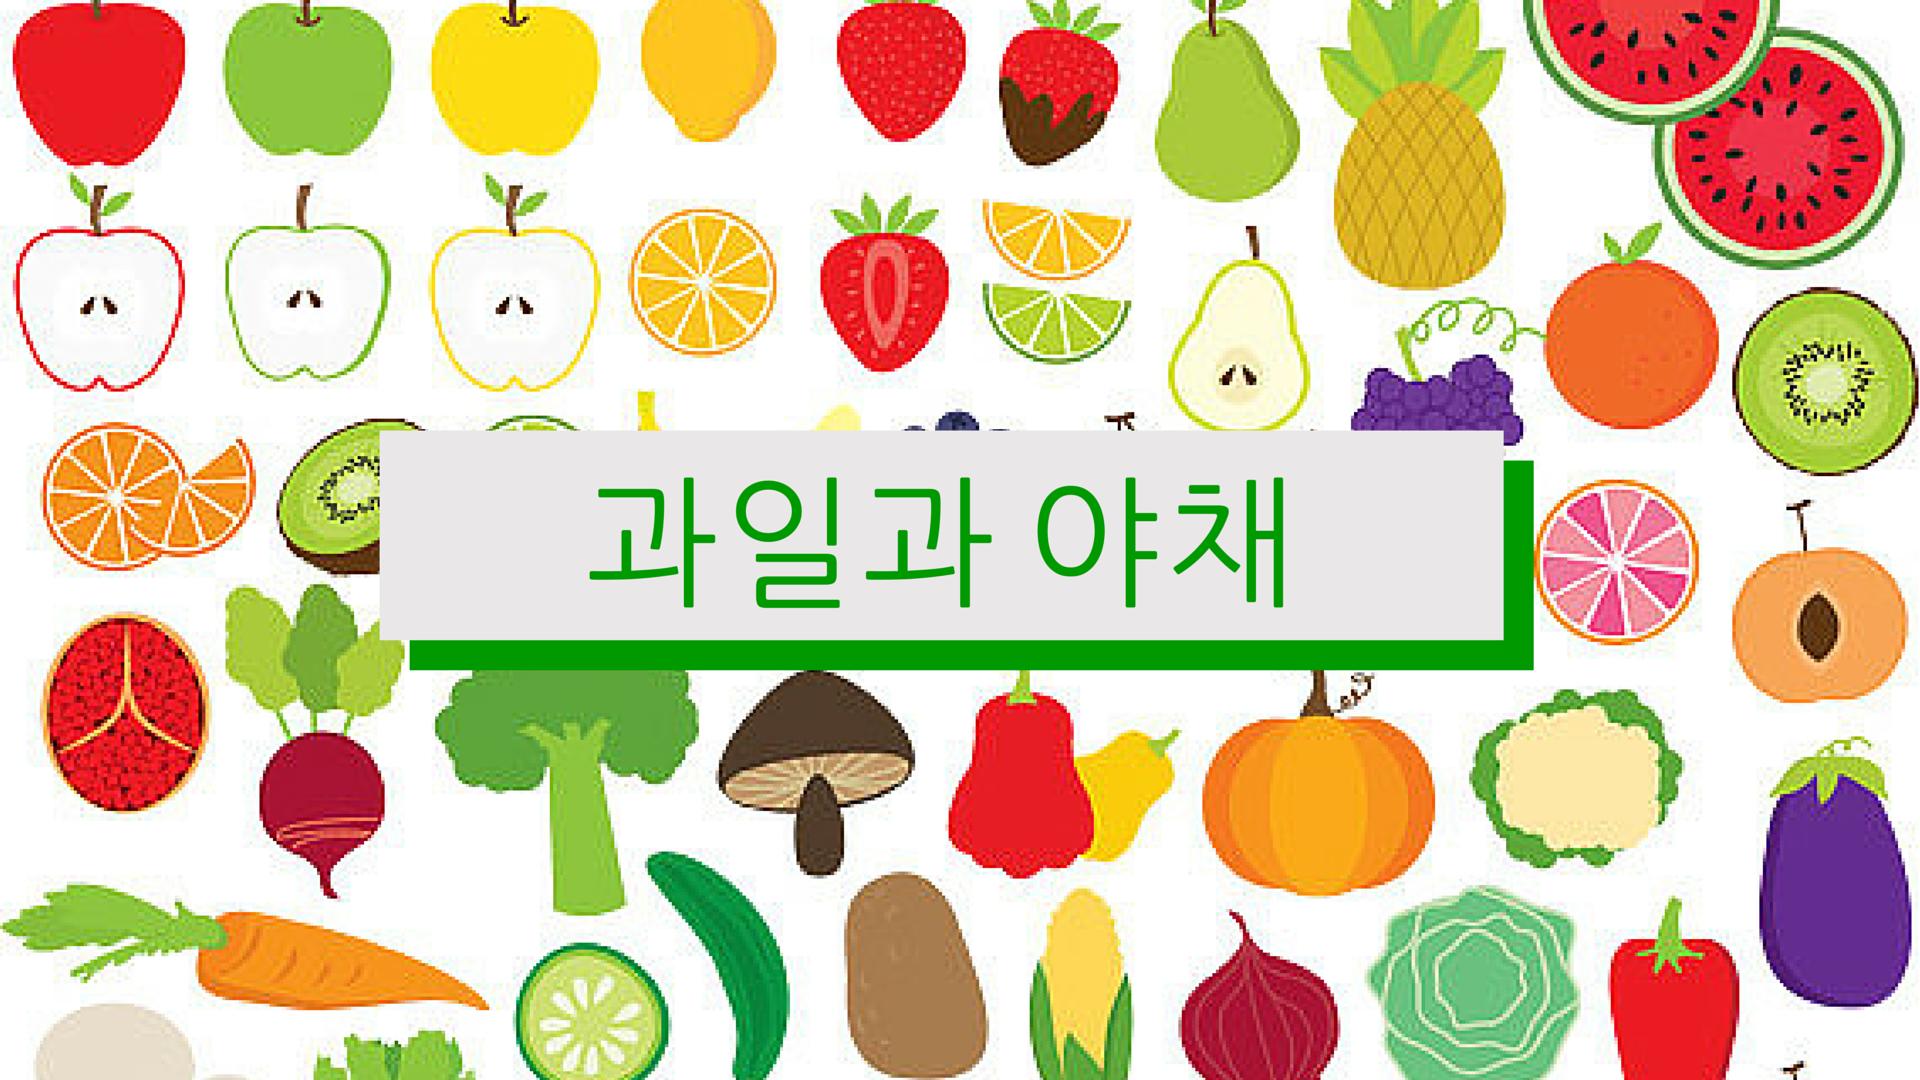 Belgian Fruit and Vegetables